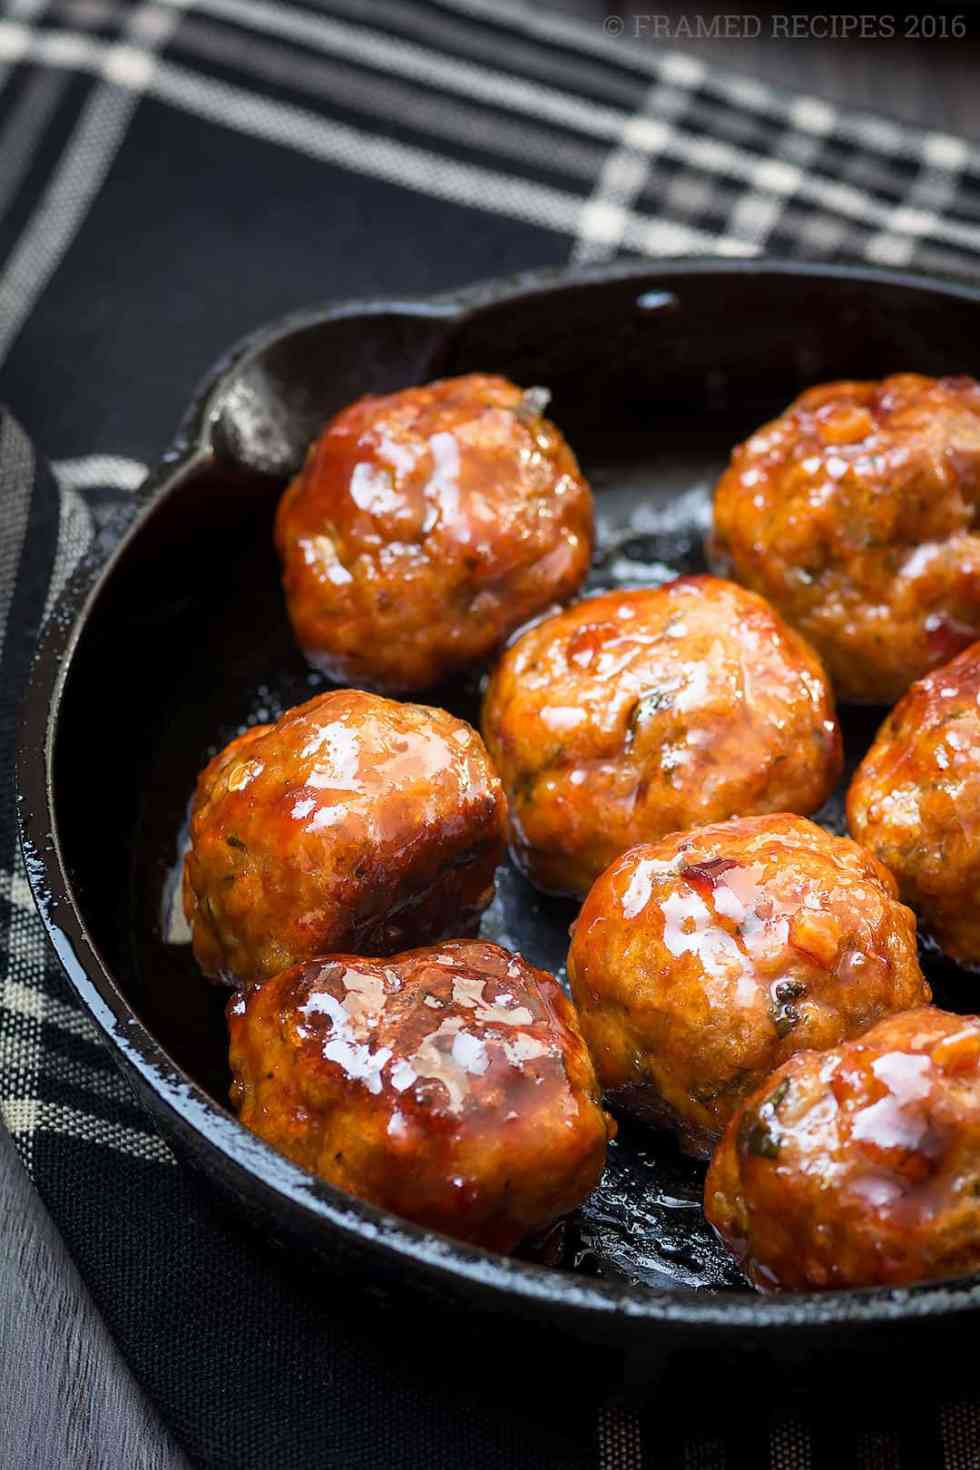 Turkey_Meatballs_With_Spicy_Brown_Sugar_Glaze_0009